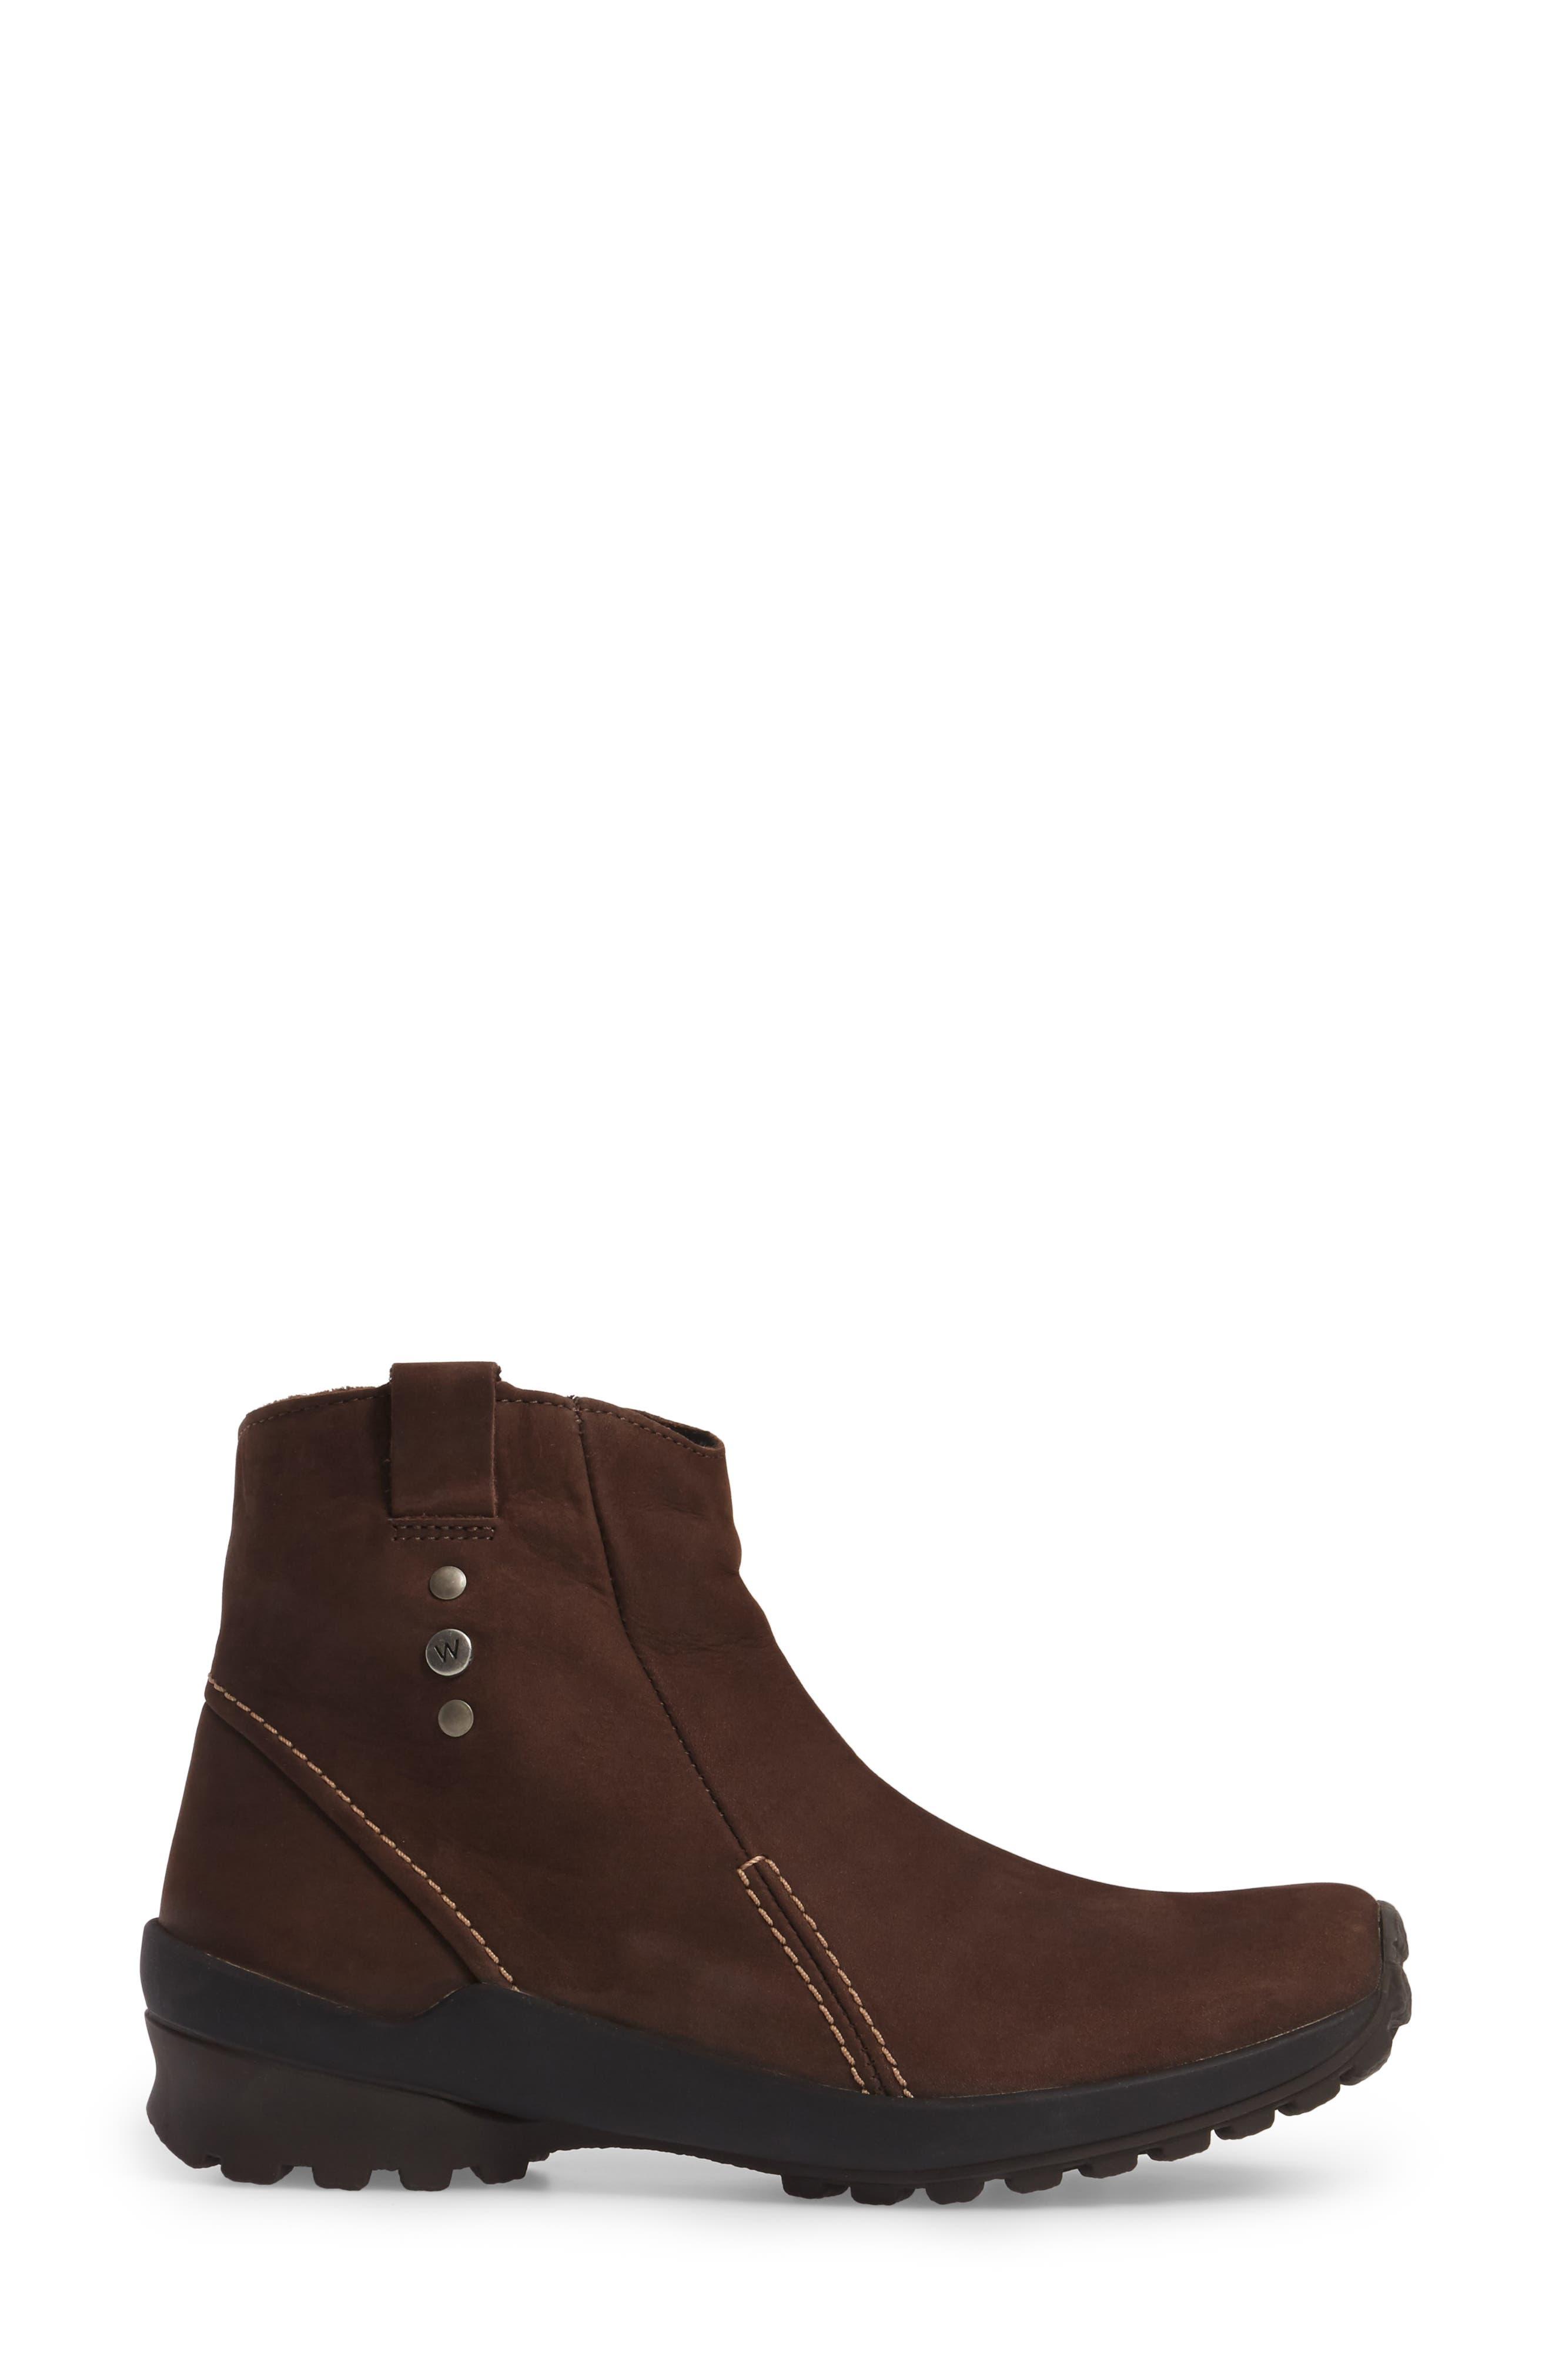 Alternate Image 3  - Wolky Zion Waterproof Insulated Winter Boot (Women)